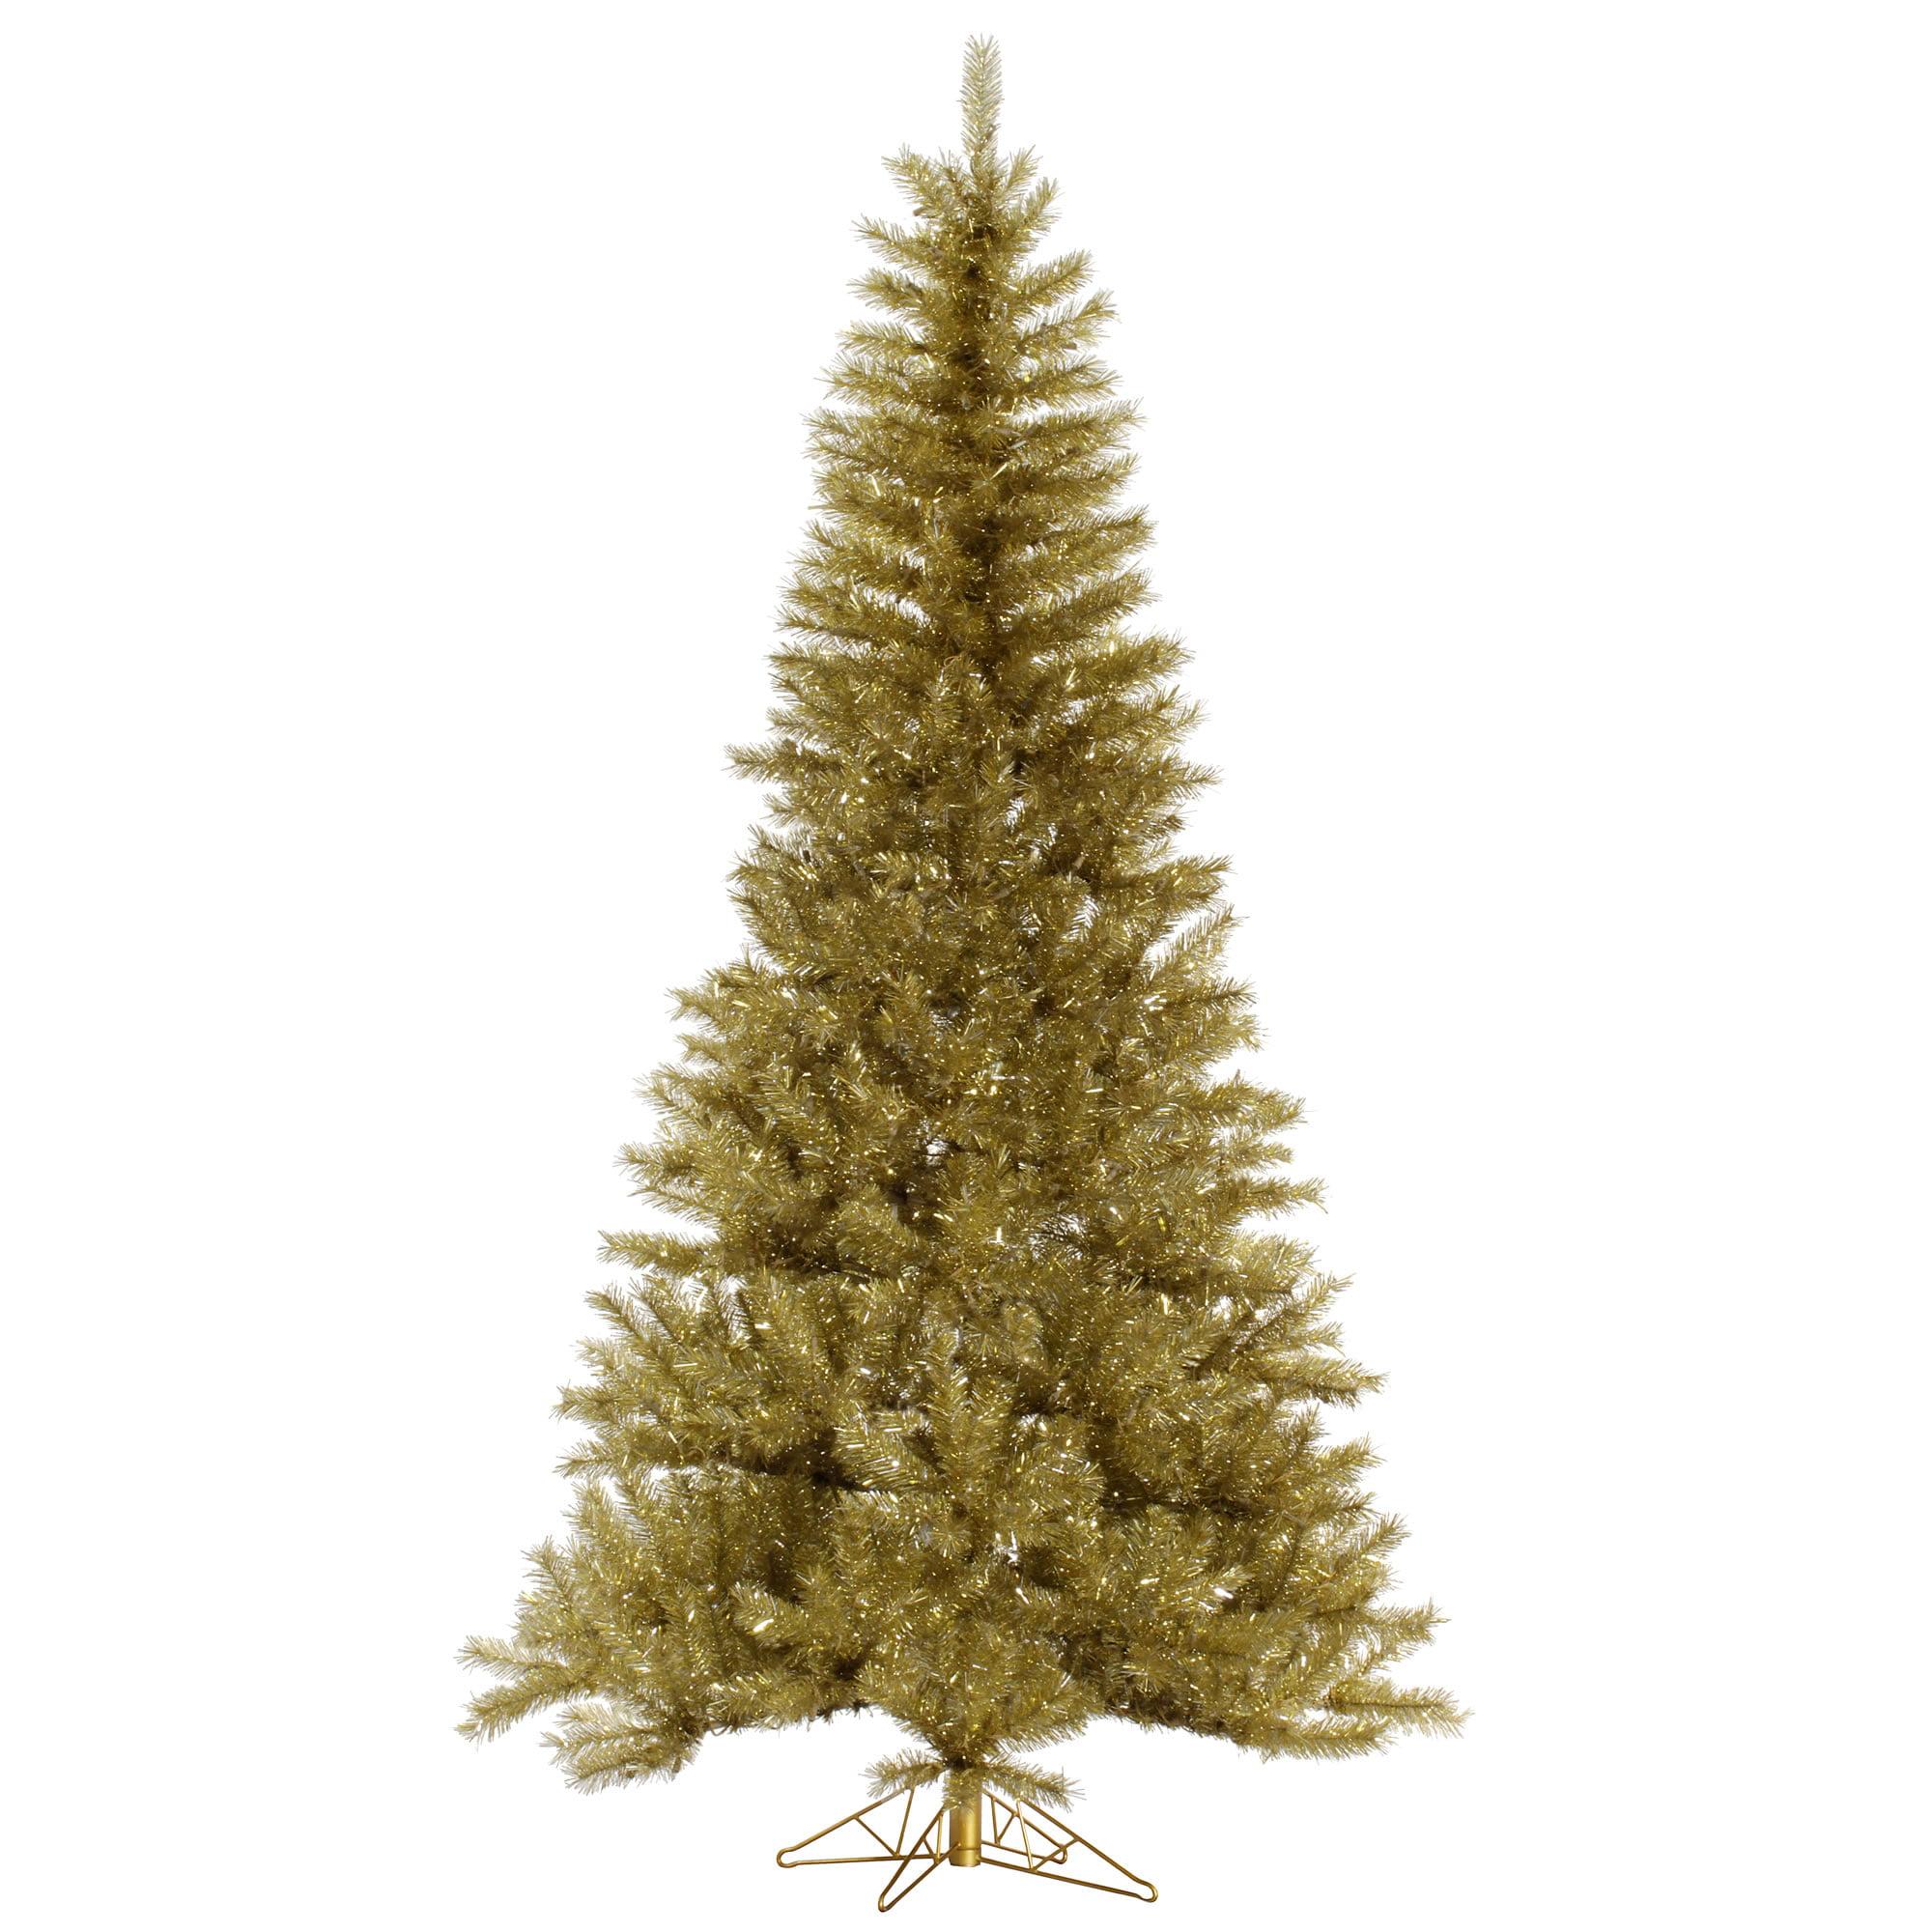 "Vickerman Artificial Christmas Tree 7.5' x 48"" Gold/Silver Tinsel Tree 1001 Tips"